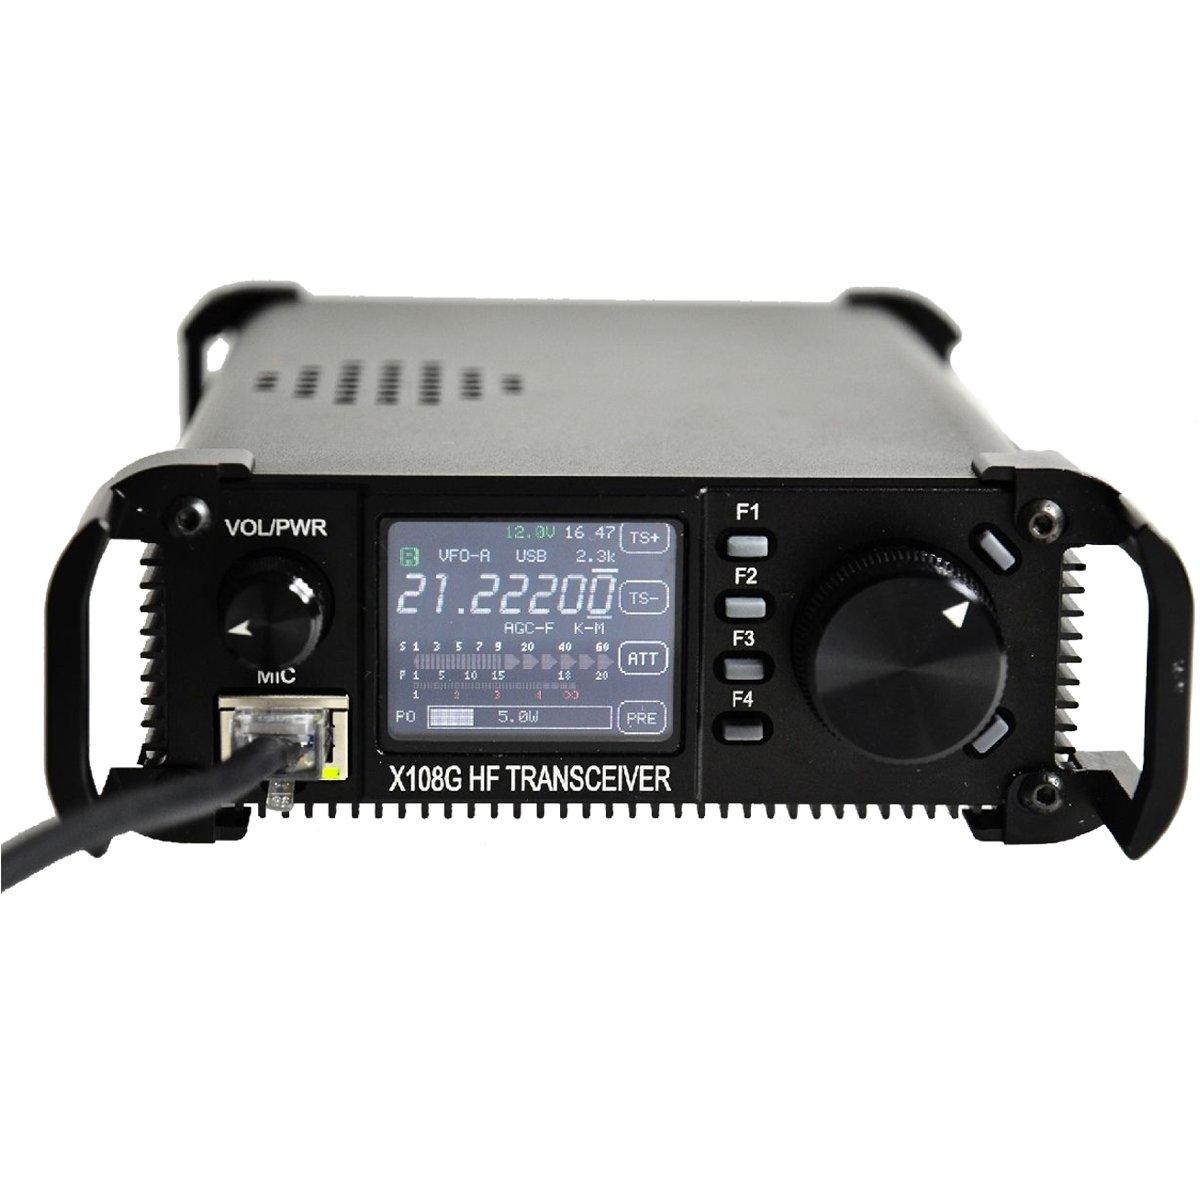 Xiegu X 108g Qrp Transceiver Outdoor Version 9 Bands Am Cw Ham Transmitter Ssb 1 20 Watts Black Cell Phones Accessories